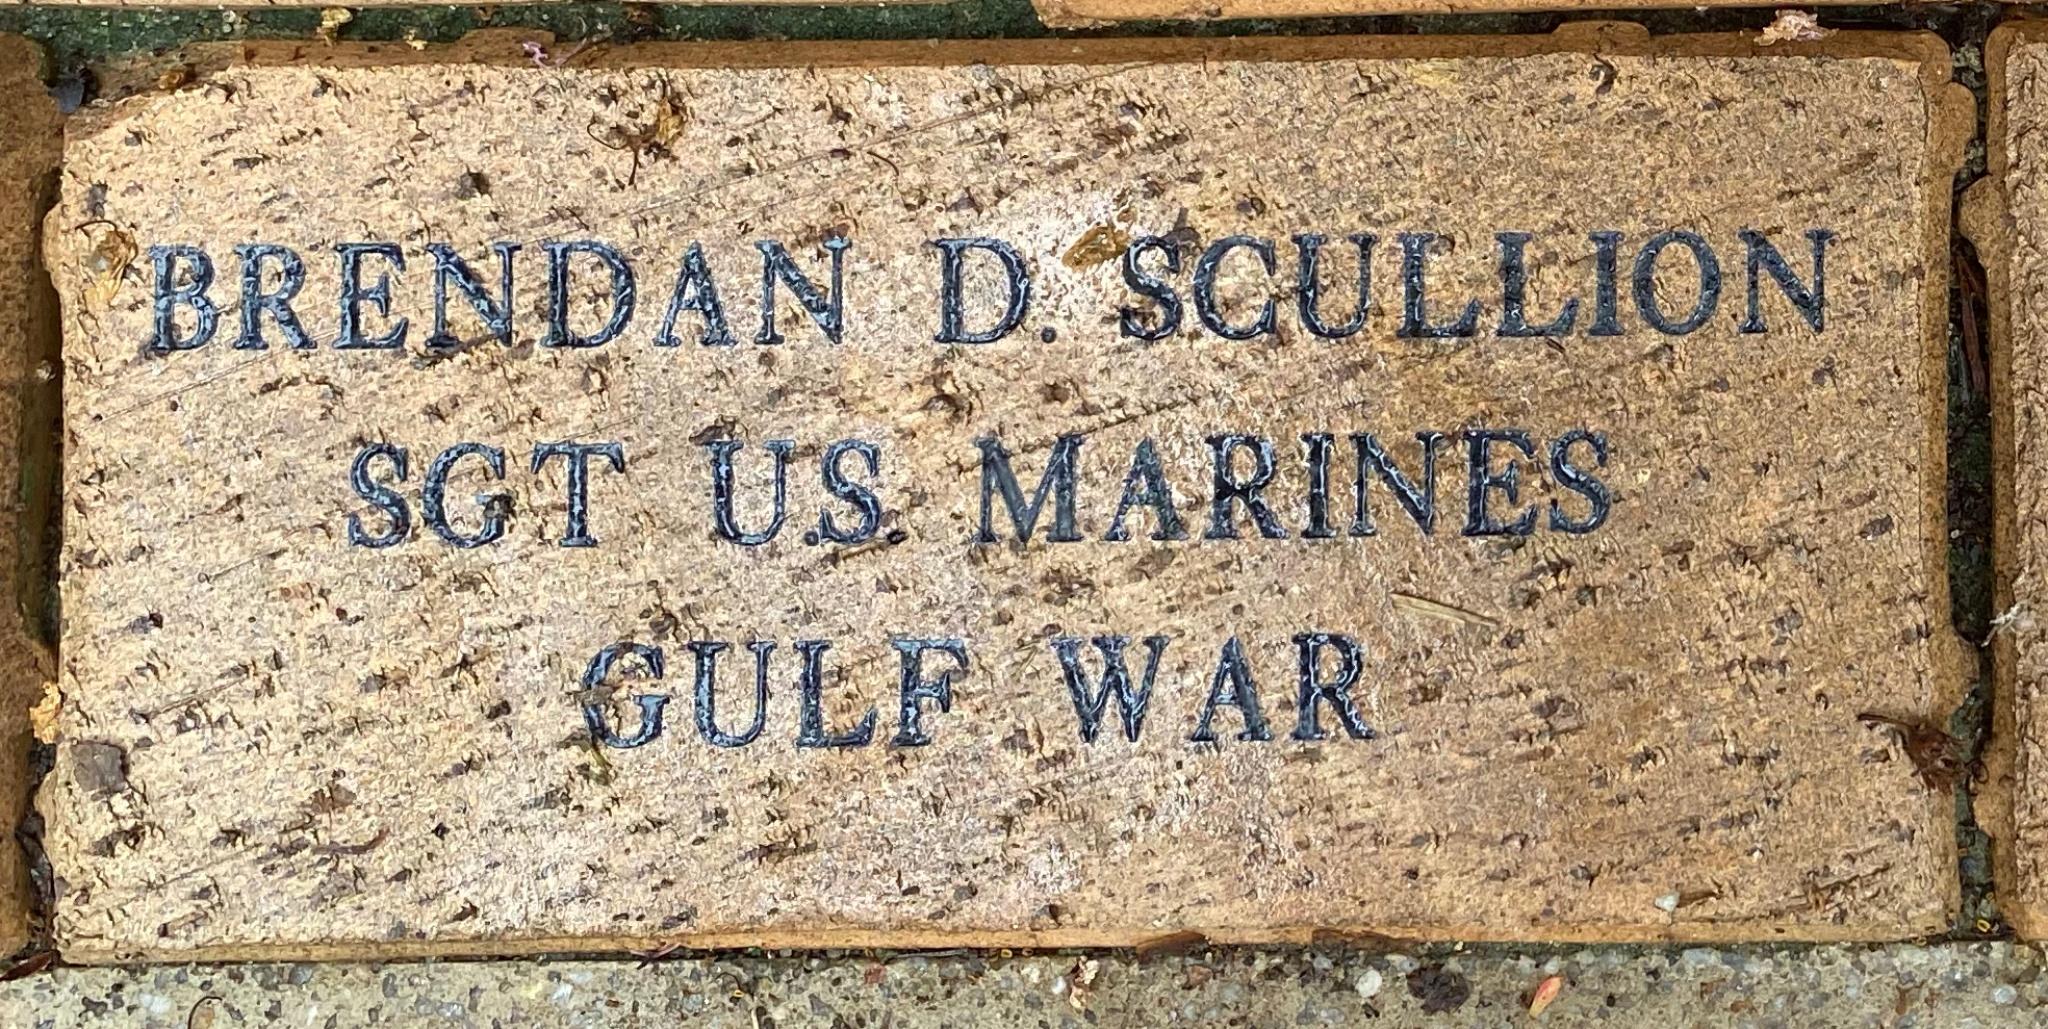 BRENDAN D. SCULLION SGT U.S. MARINES GULF WAR